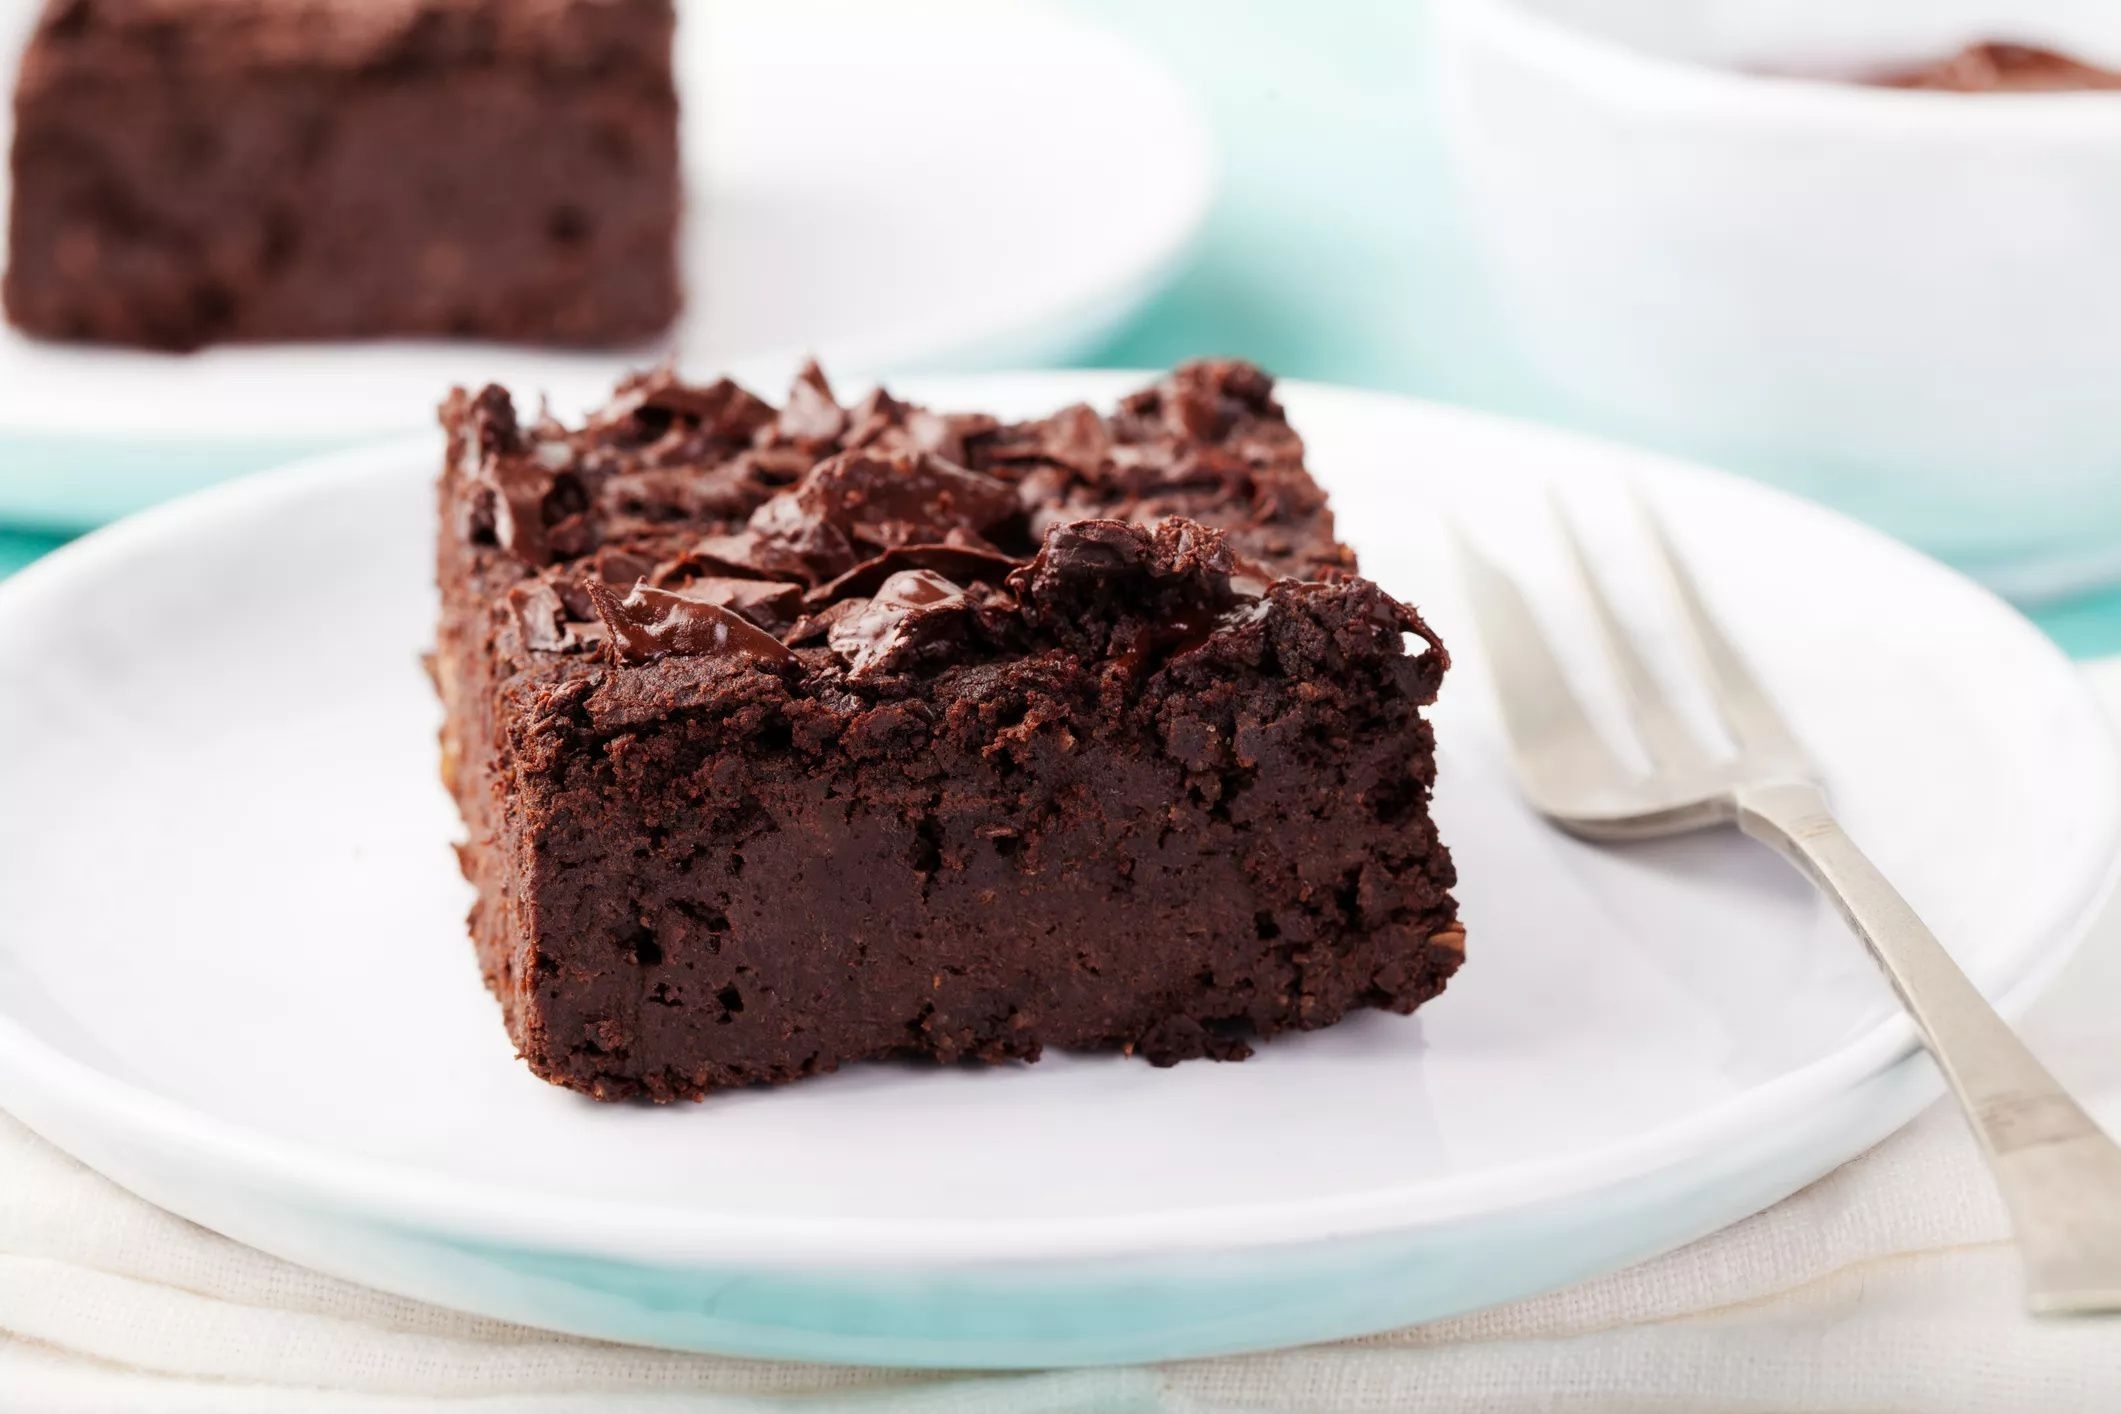 Без духовки! Без муки! Мега шоколадный торт